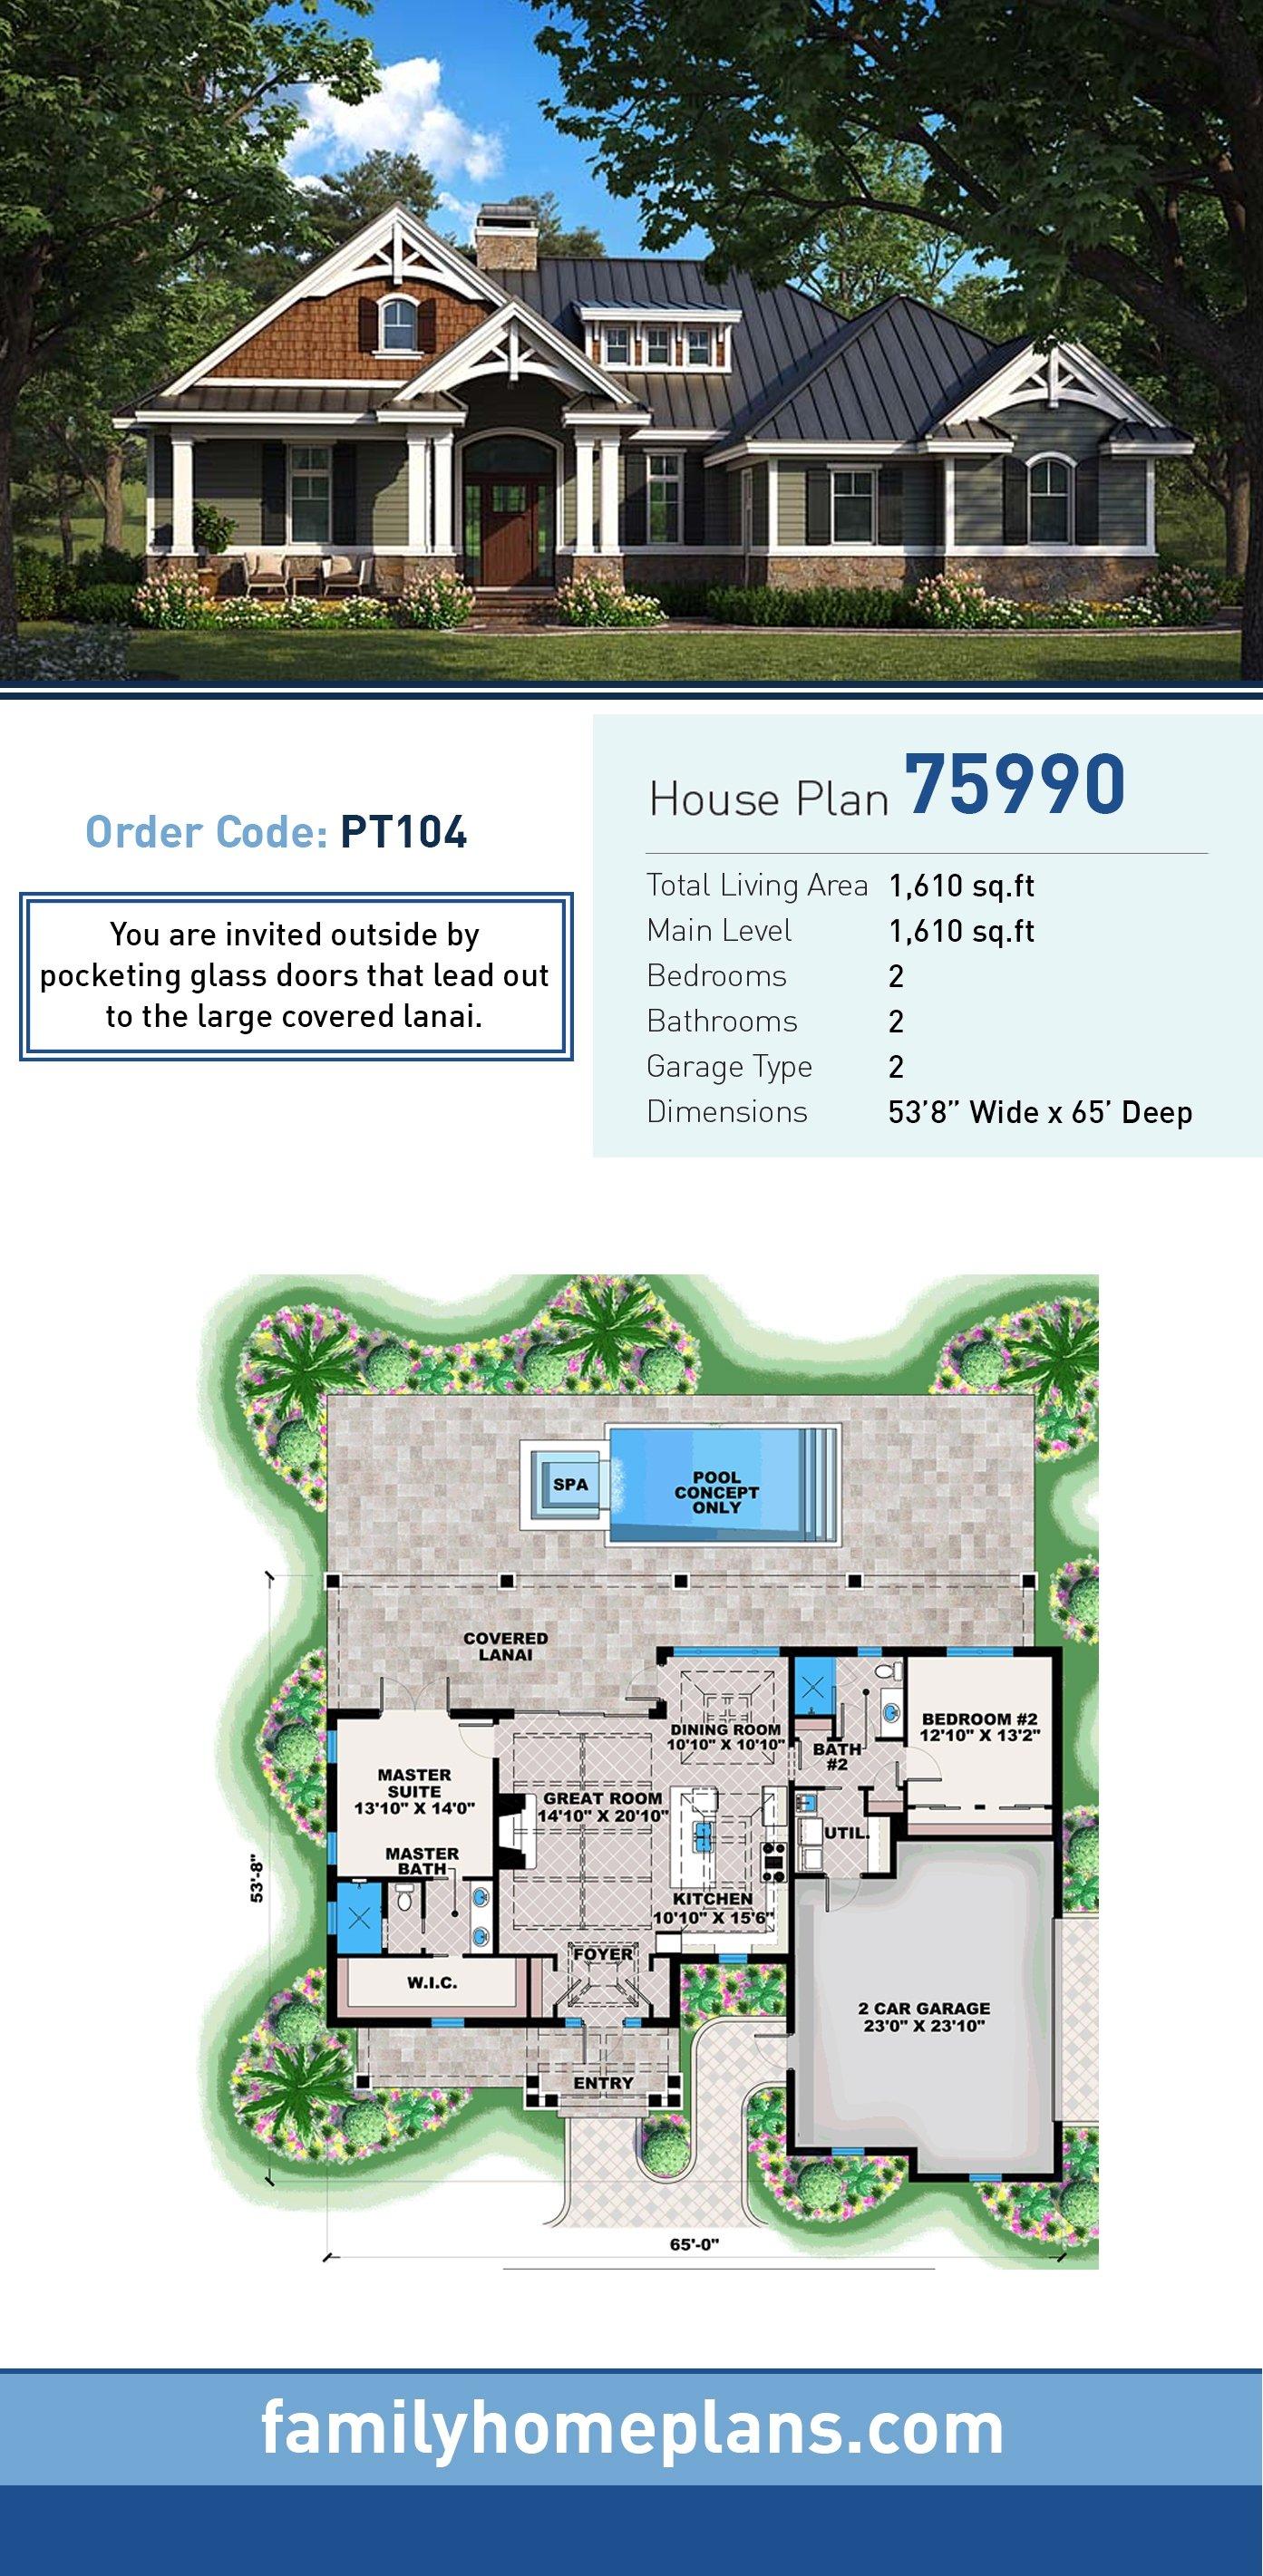 Cottage, Craftsman, Florida, Southern House Plan 75990 with 2 Beds, 2 Baths, 2 Car Garage